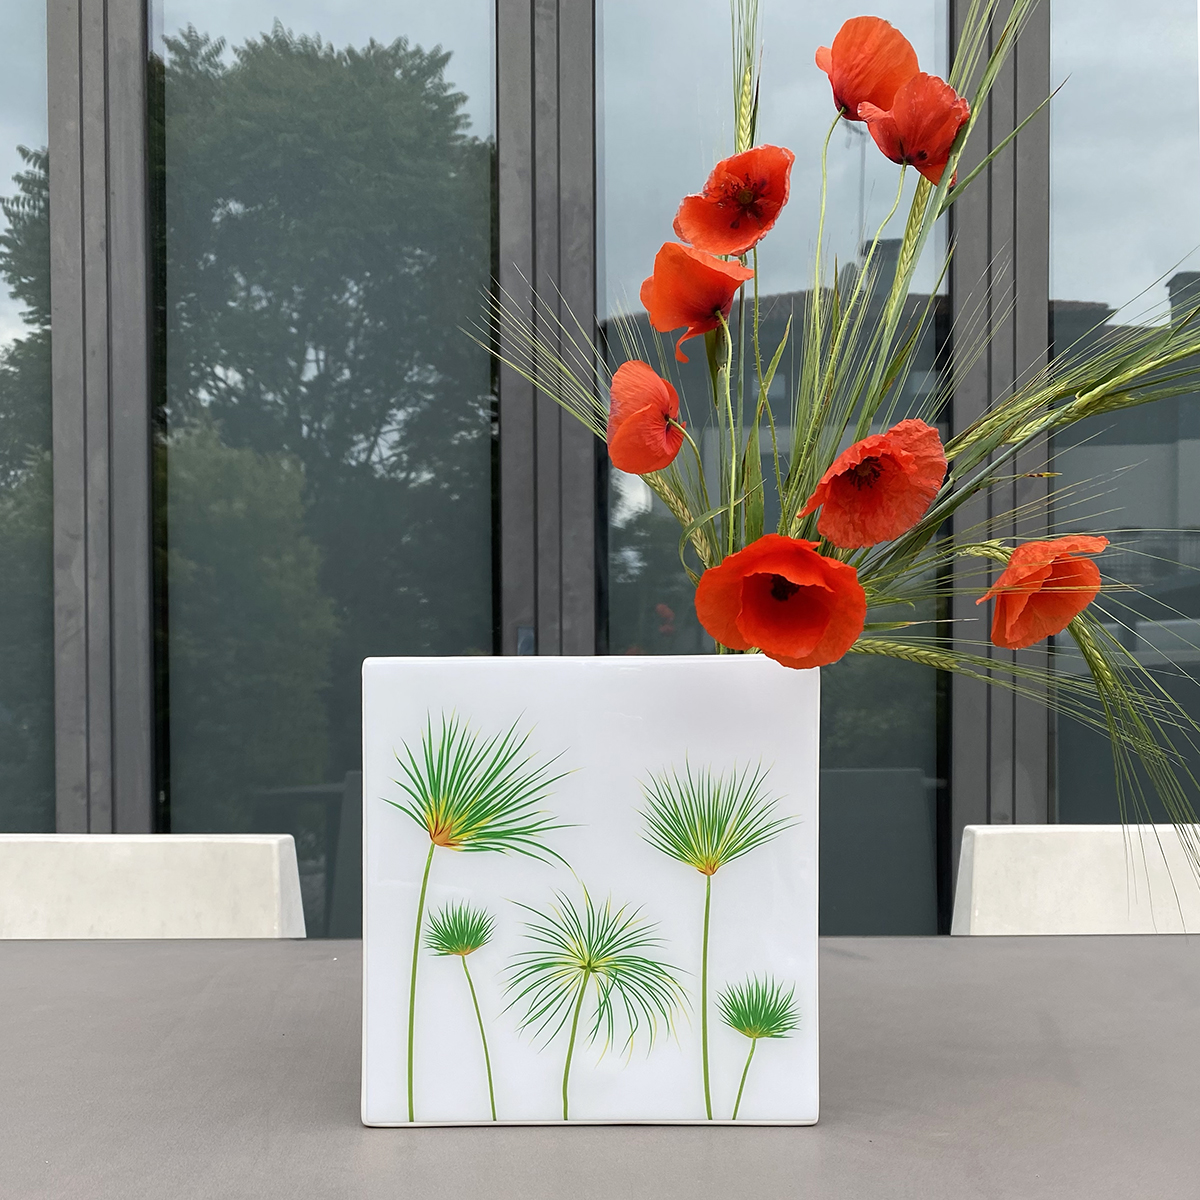 vaso design bianco raffigurante dei papiri con dei papaveri all'interno